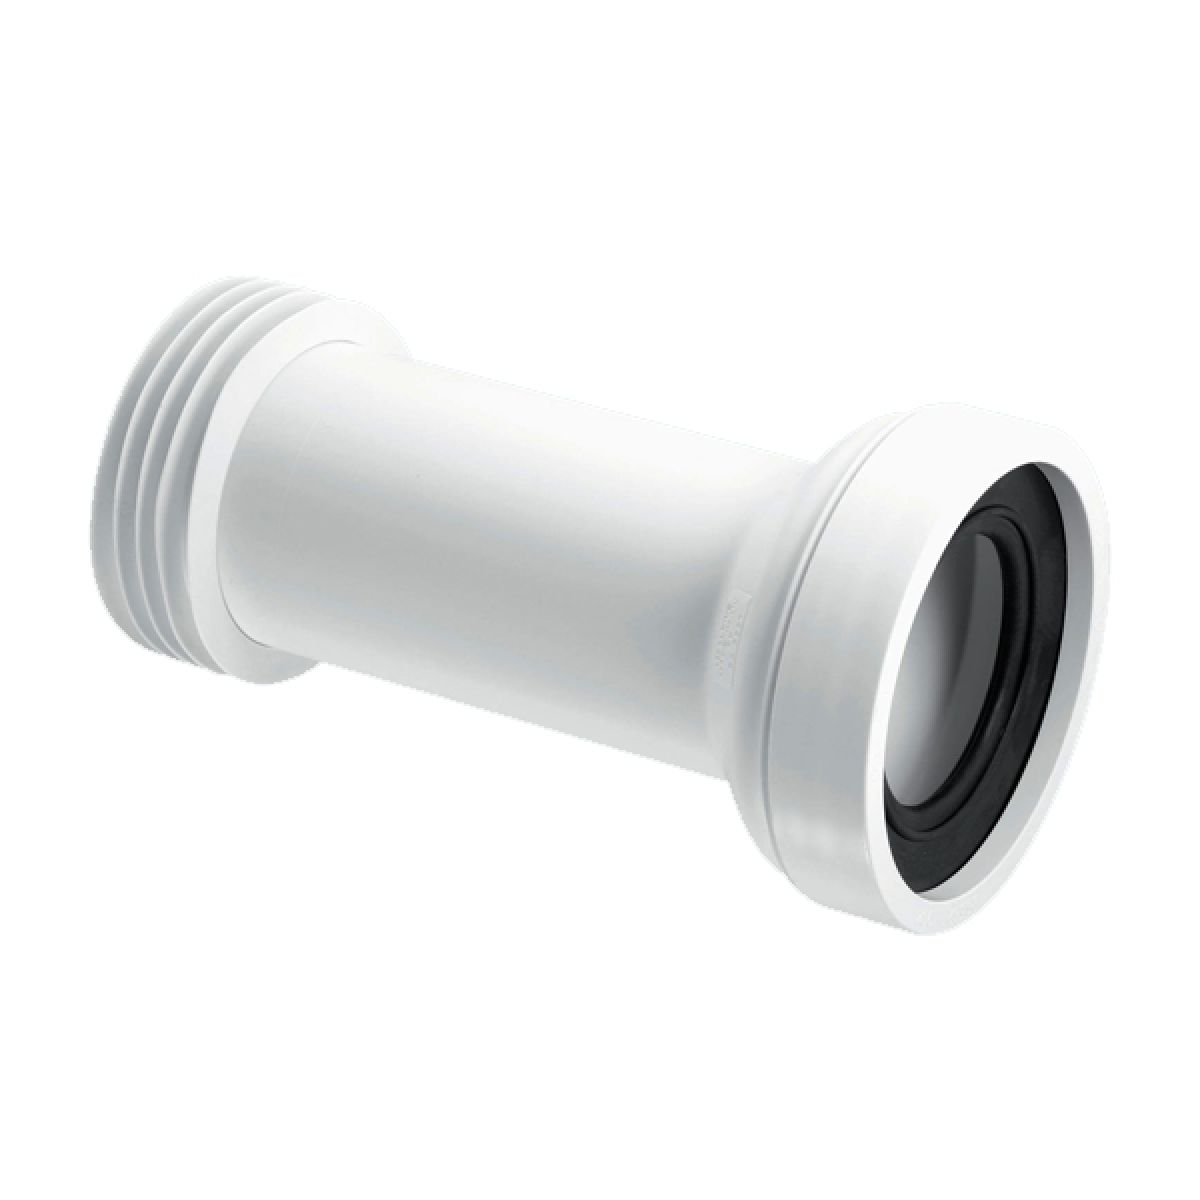 McAlpine WC-CON2 4